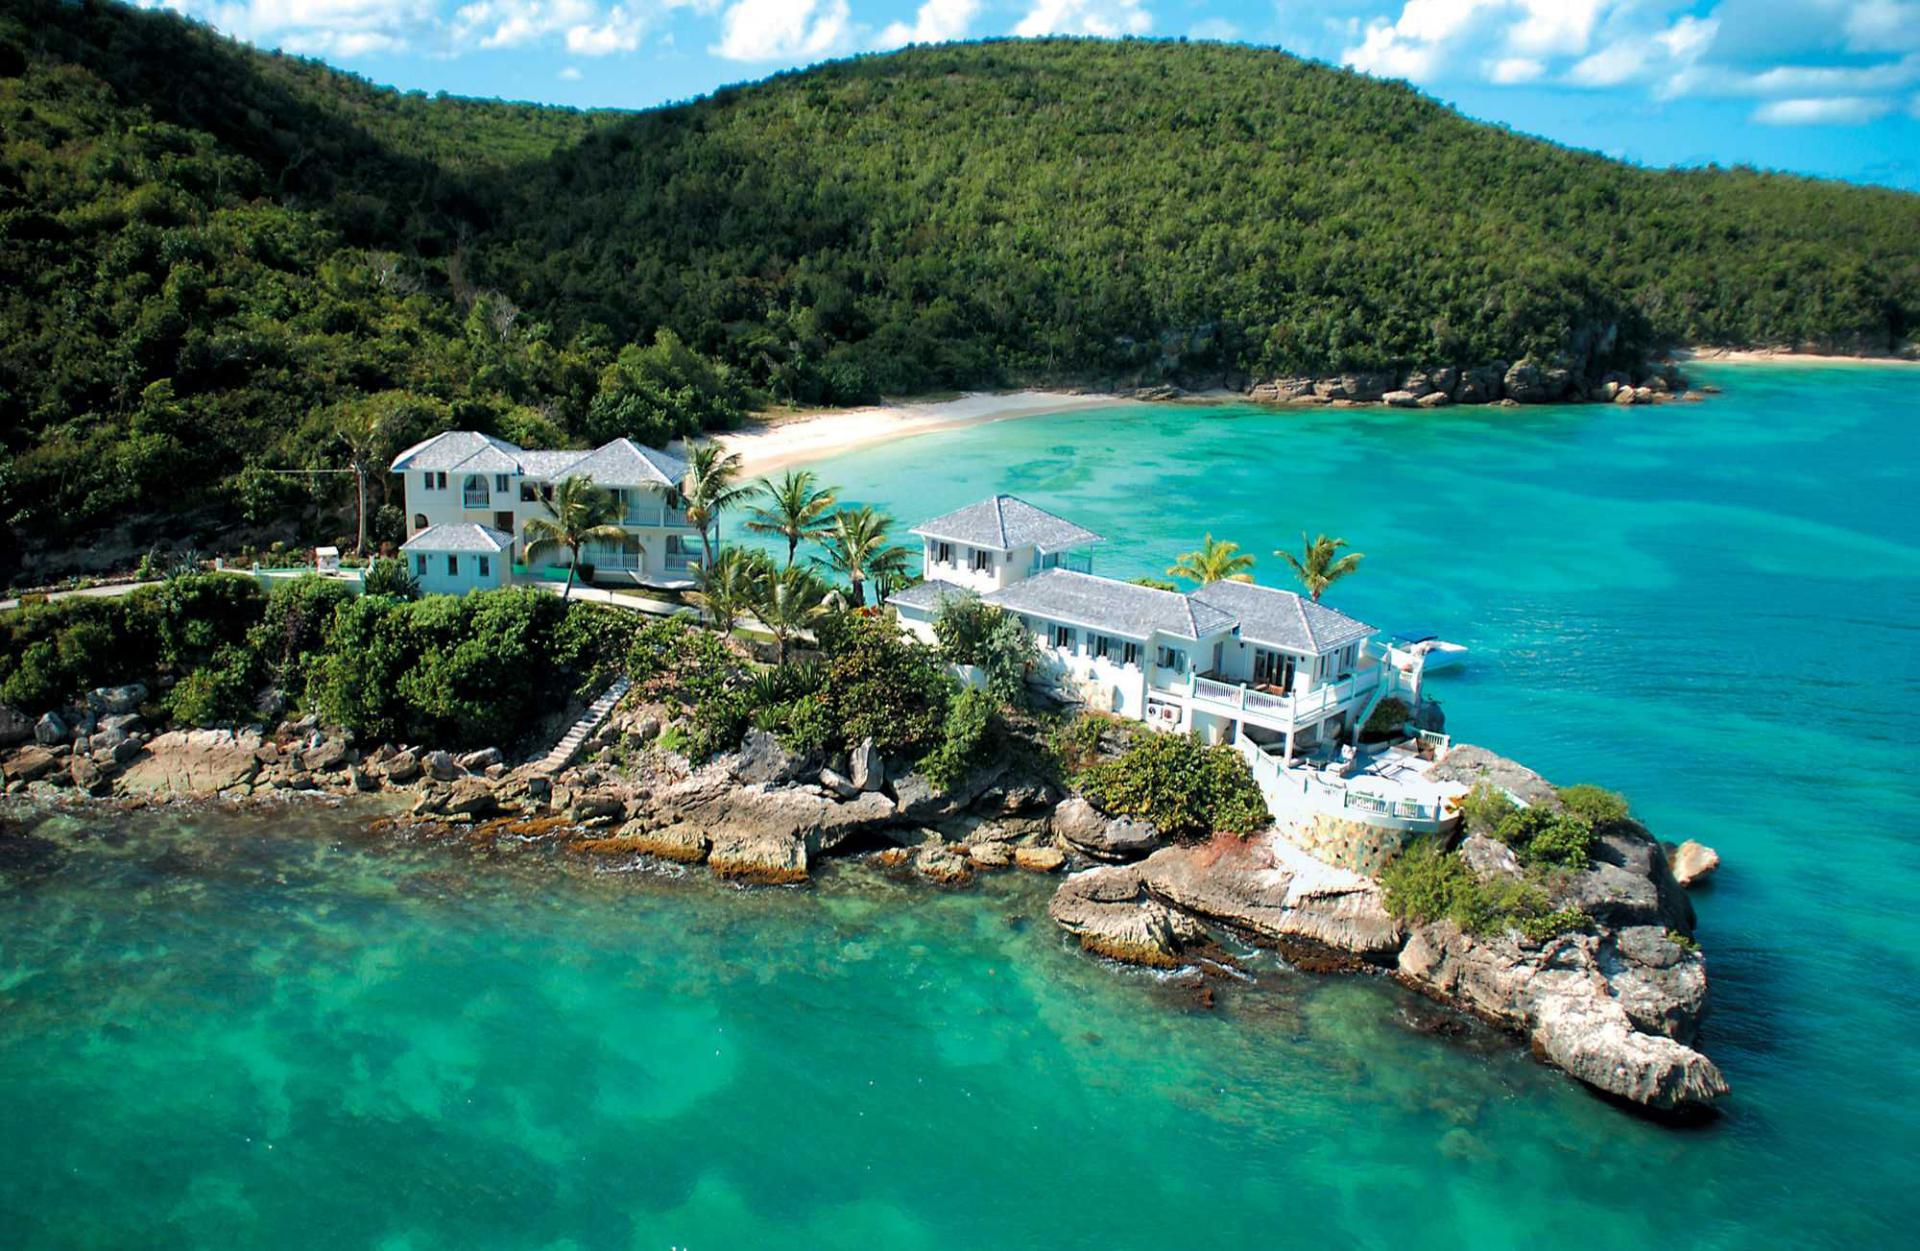 Как открыть бизнес на Антигуа и Барбуда | Migronis